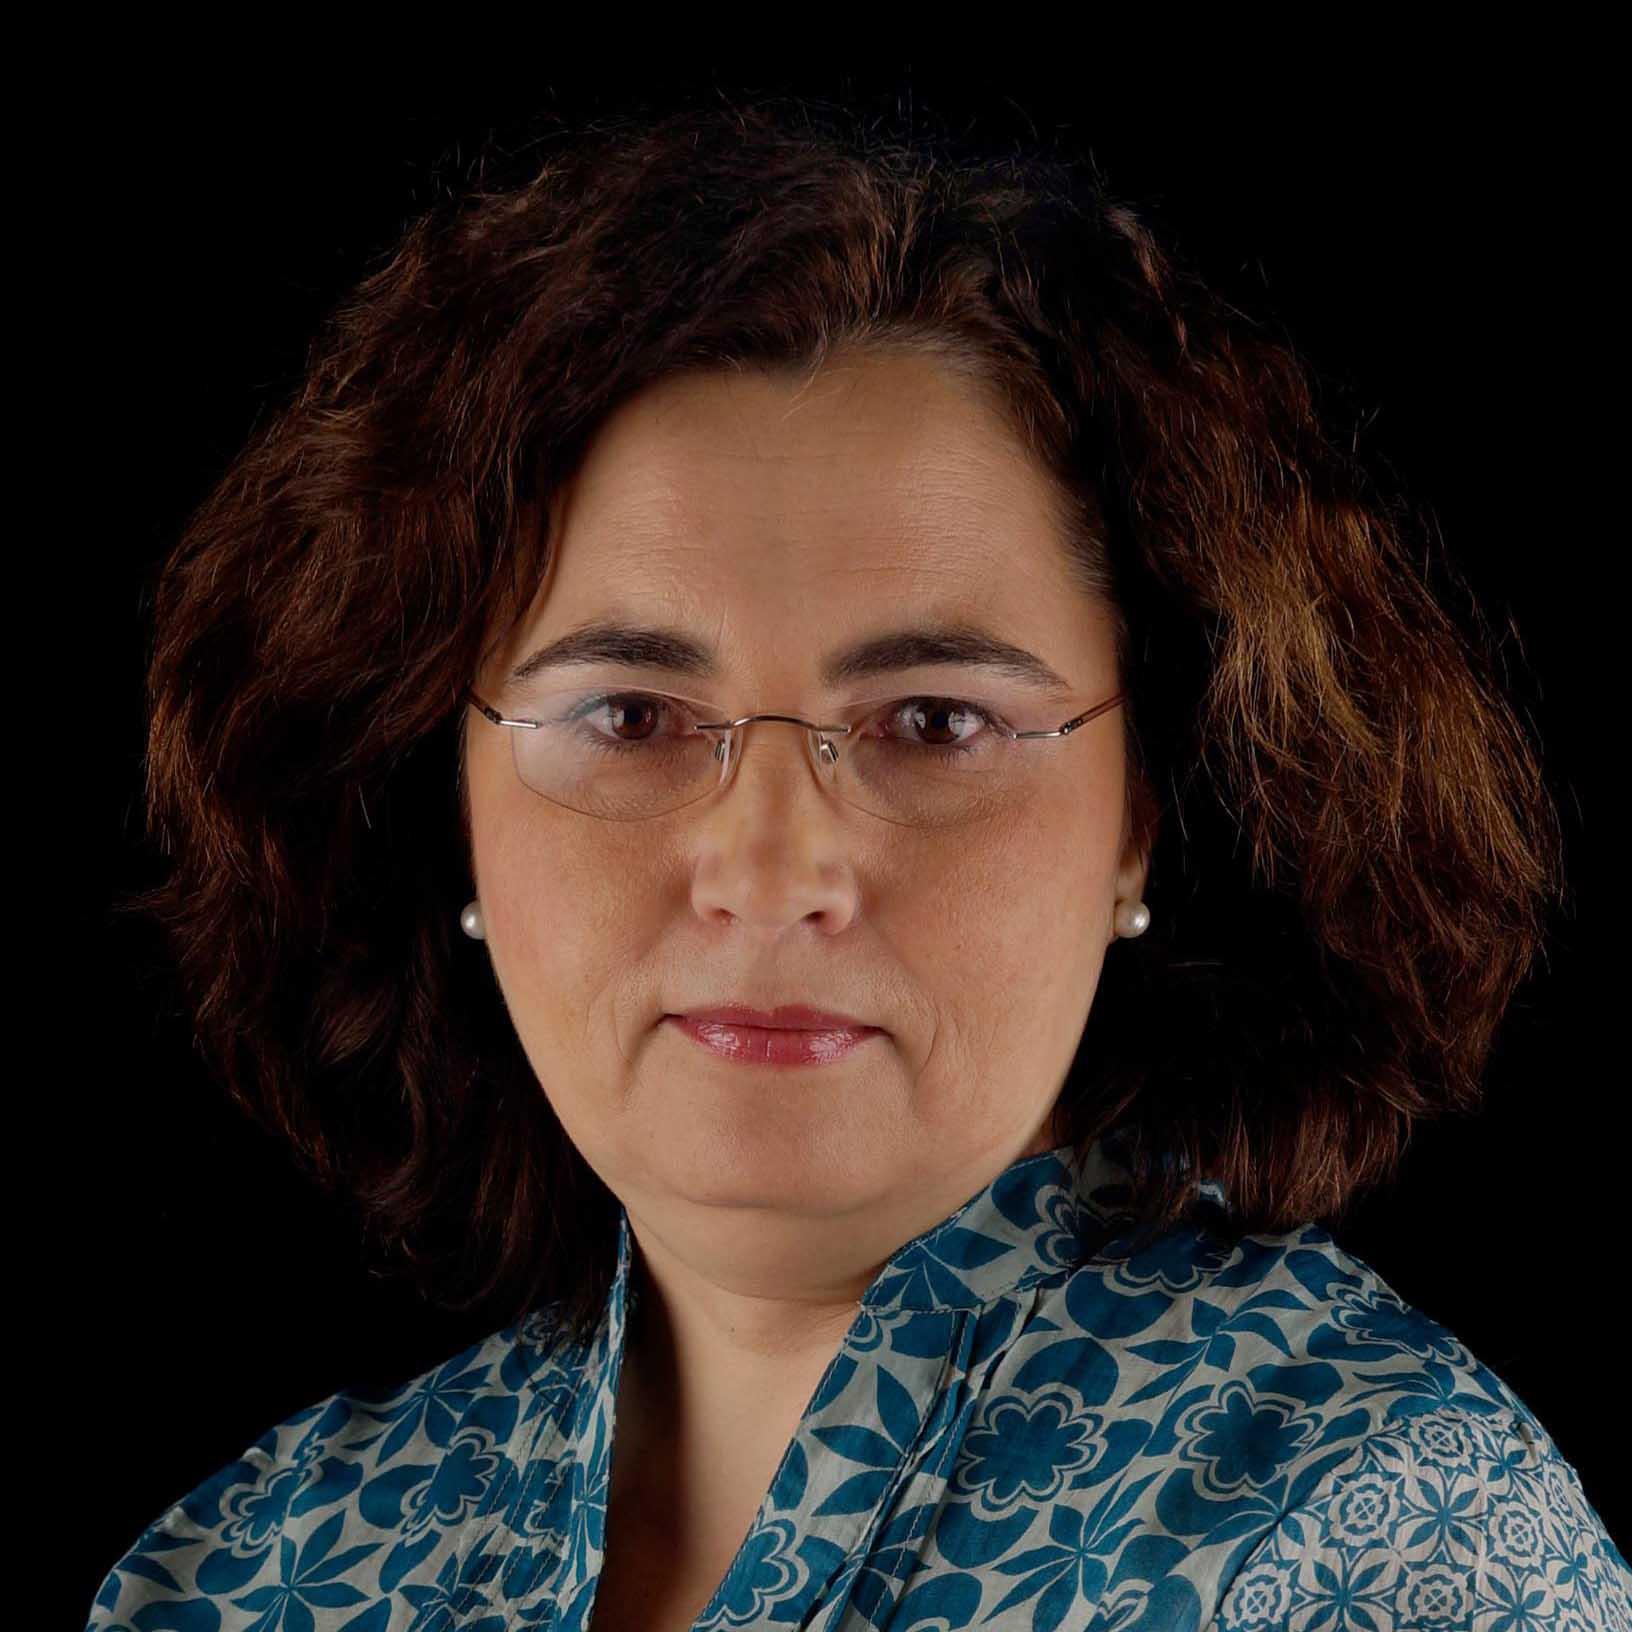 María  Alcalá-Santaella